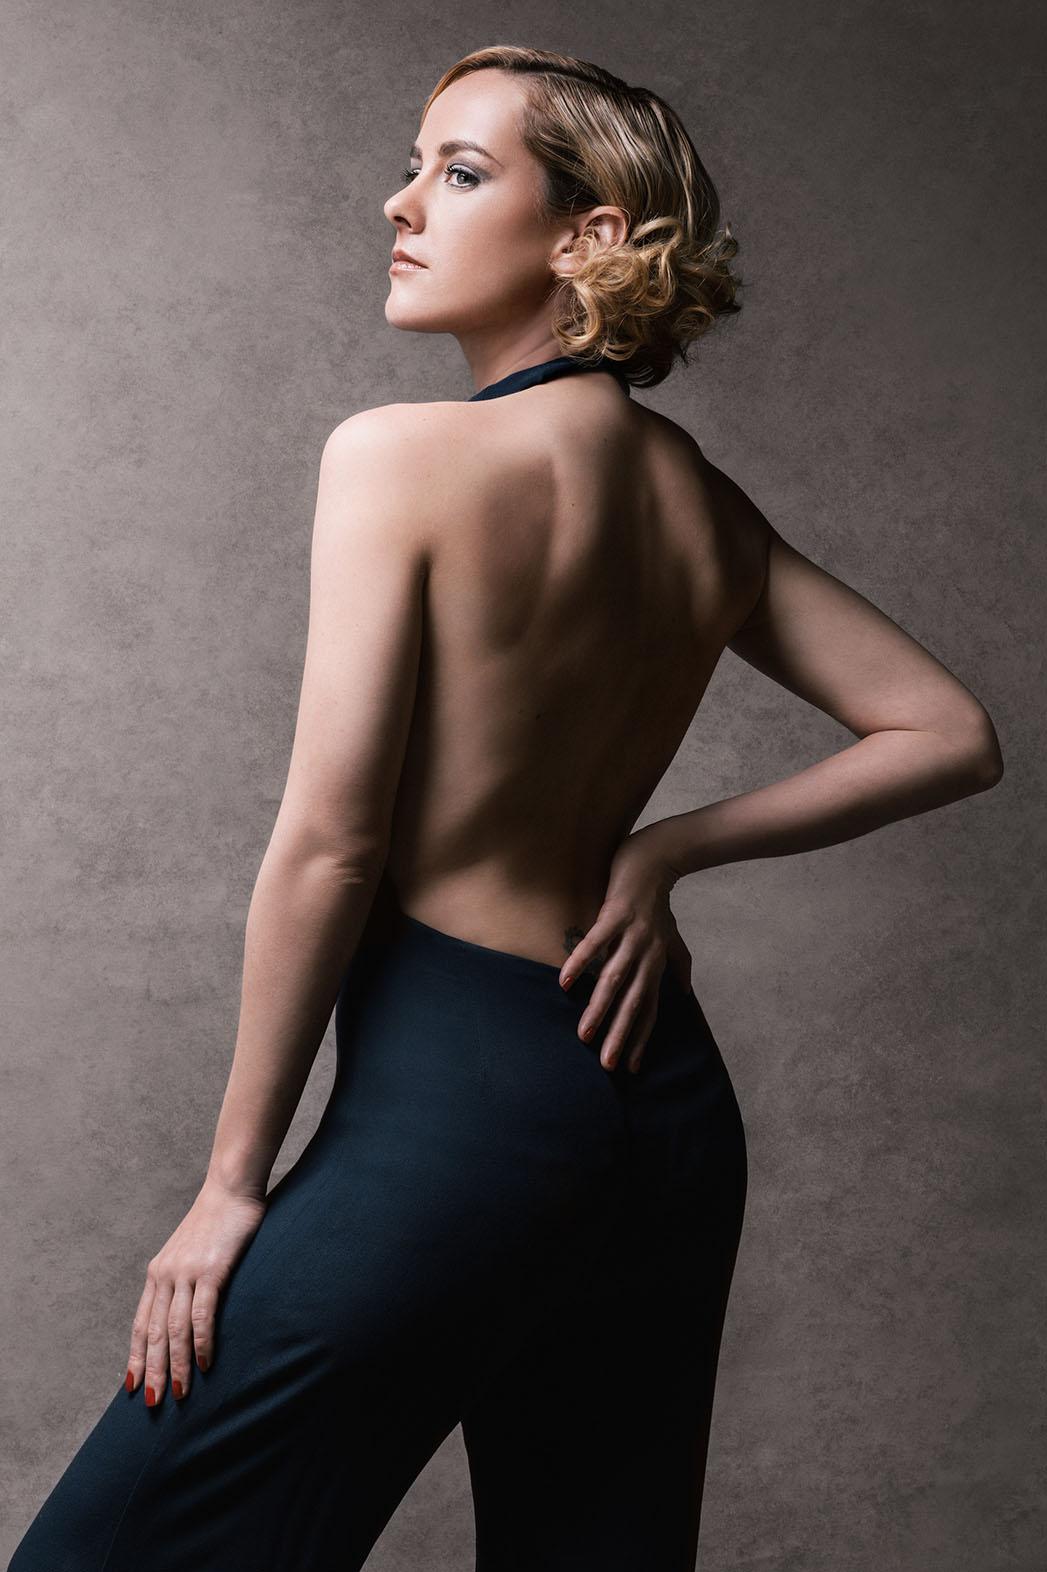 Jena Malone - 'The Art of Discovery: Hollywood Stars ... Amber Heard